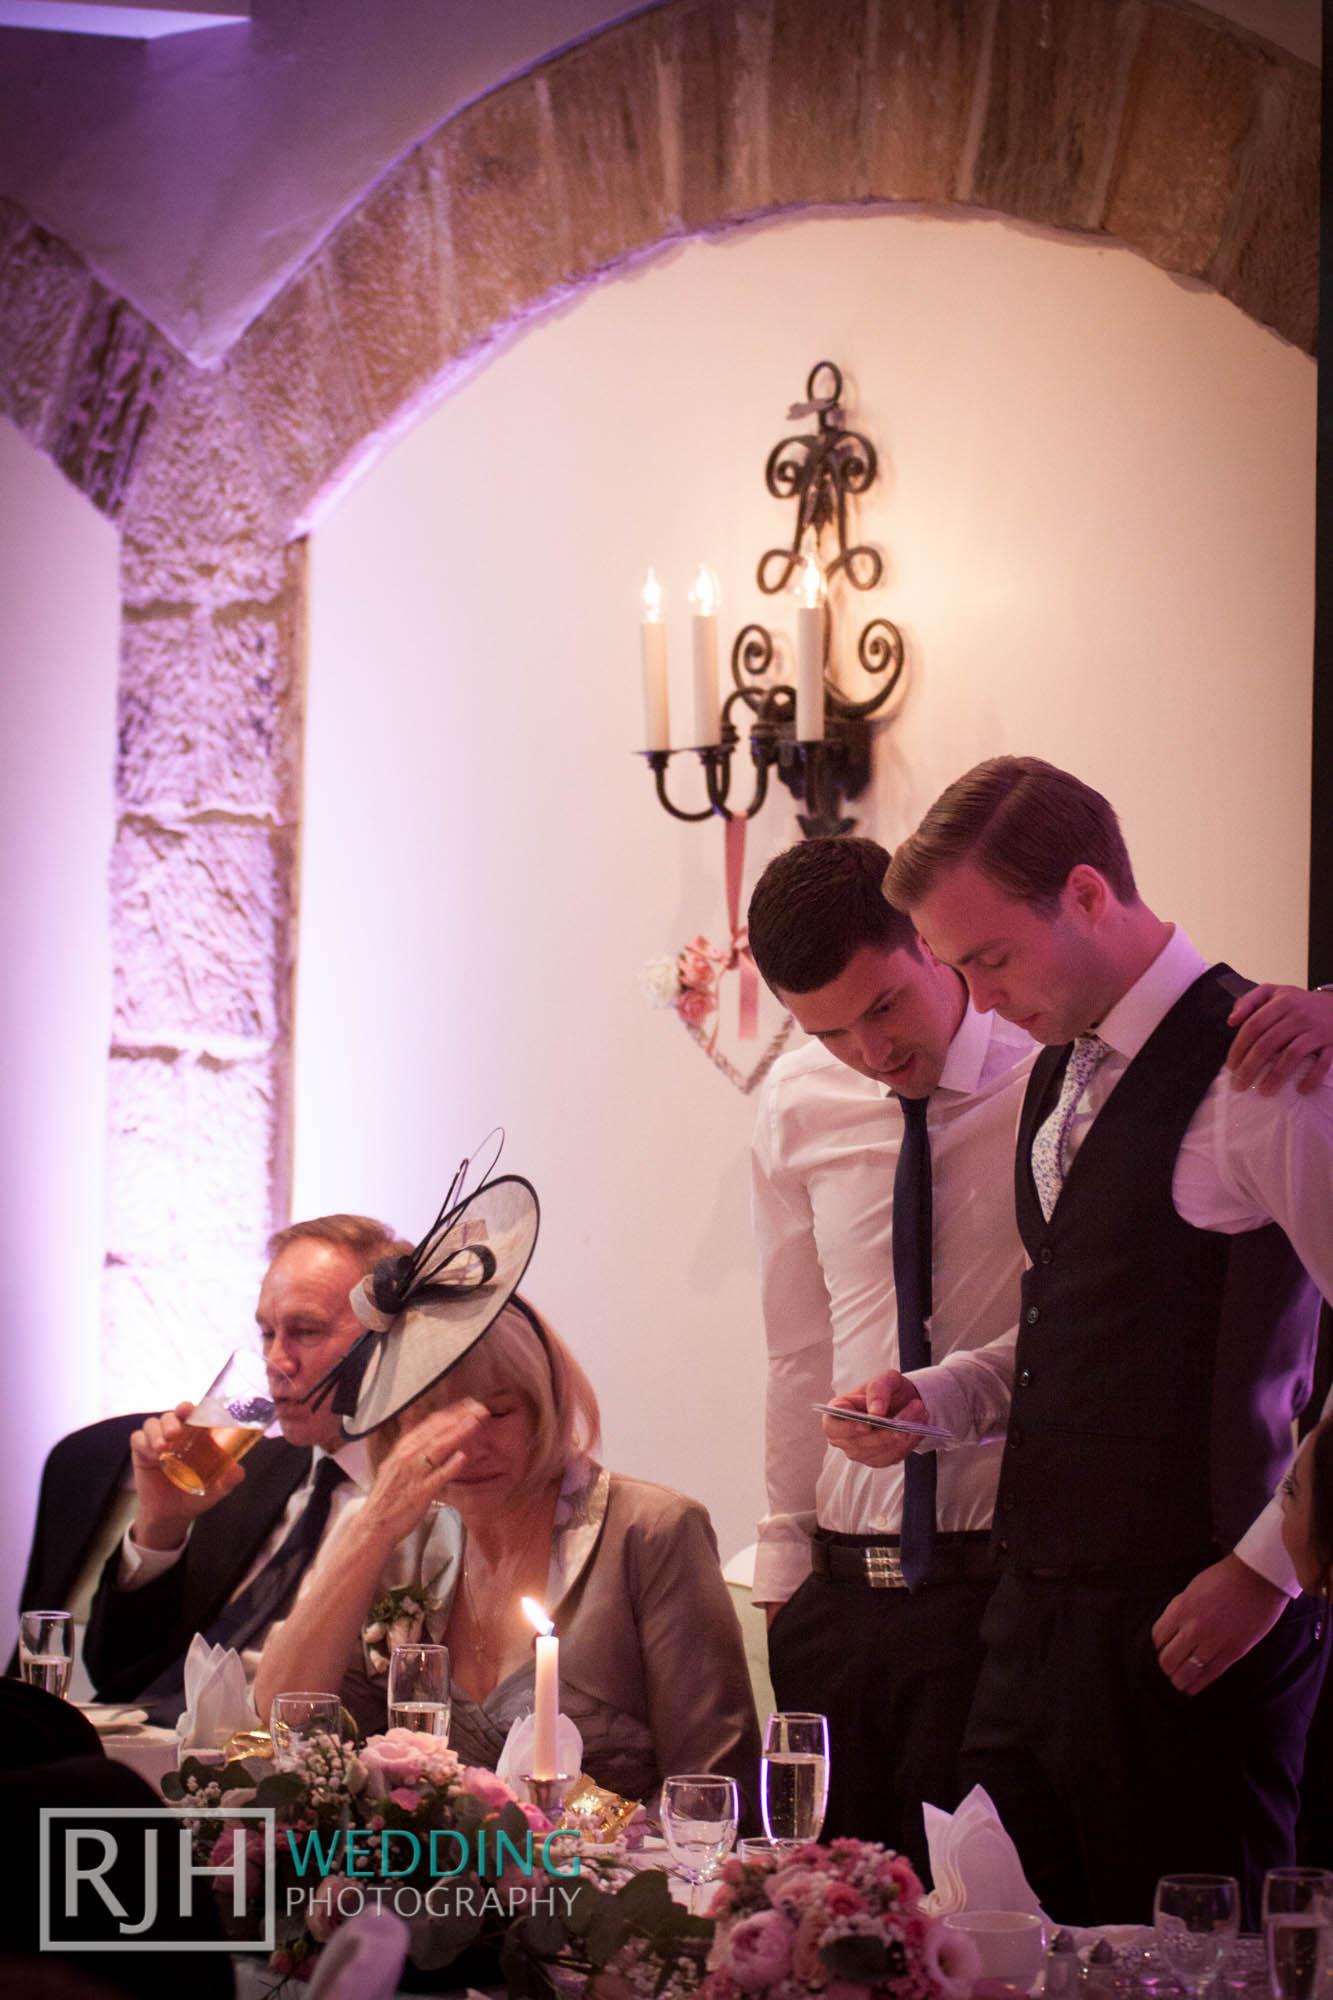 RJH Wedding Photography_Tankersley Manor Wedding_47.jpg